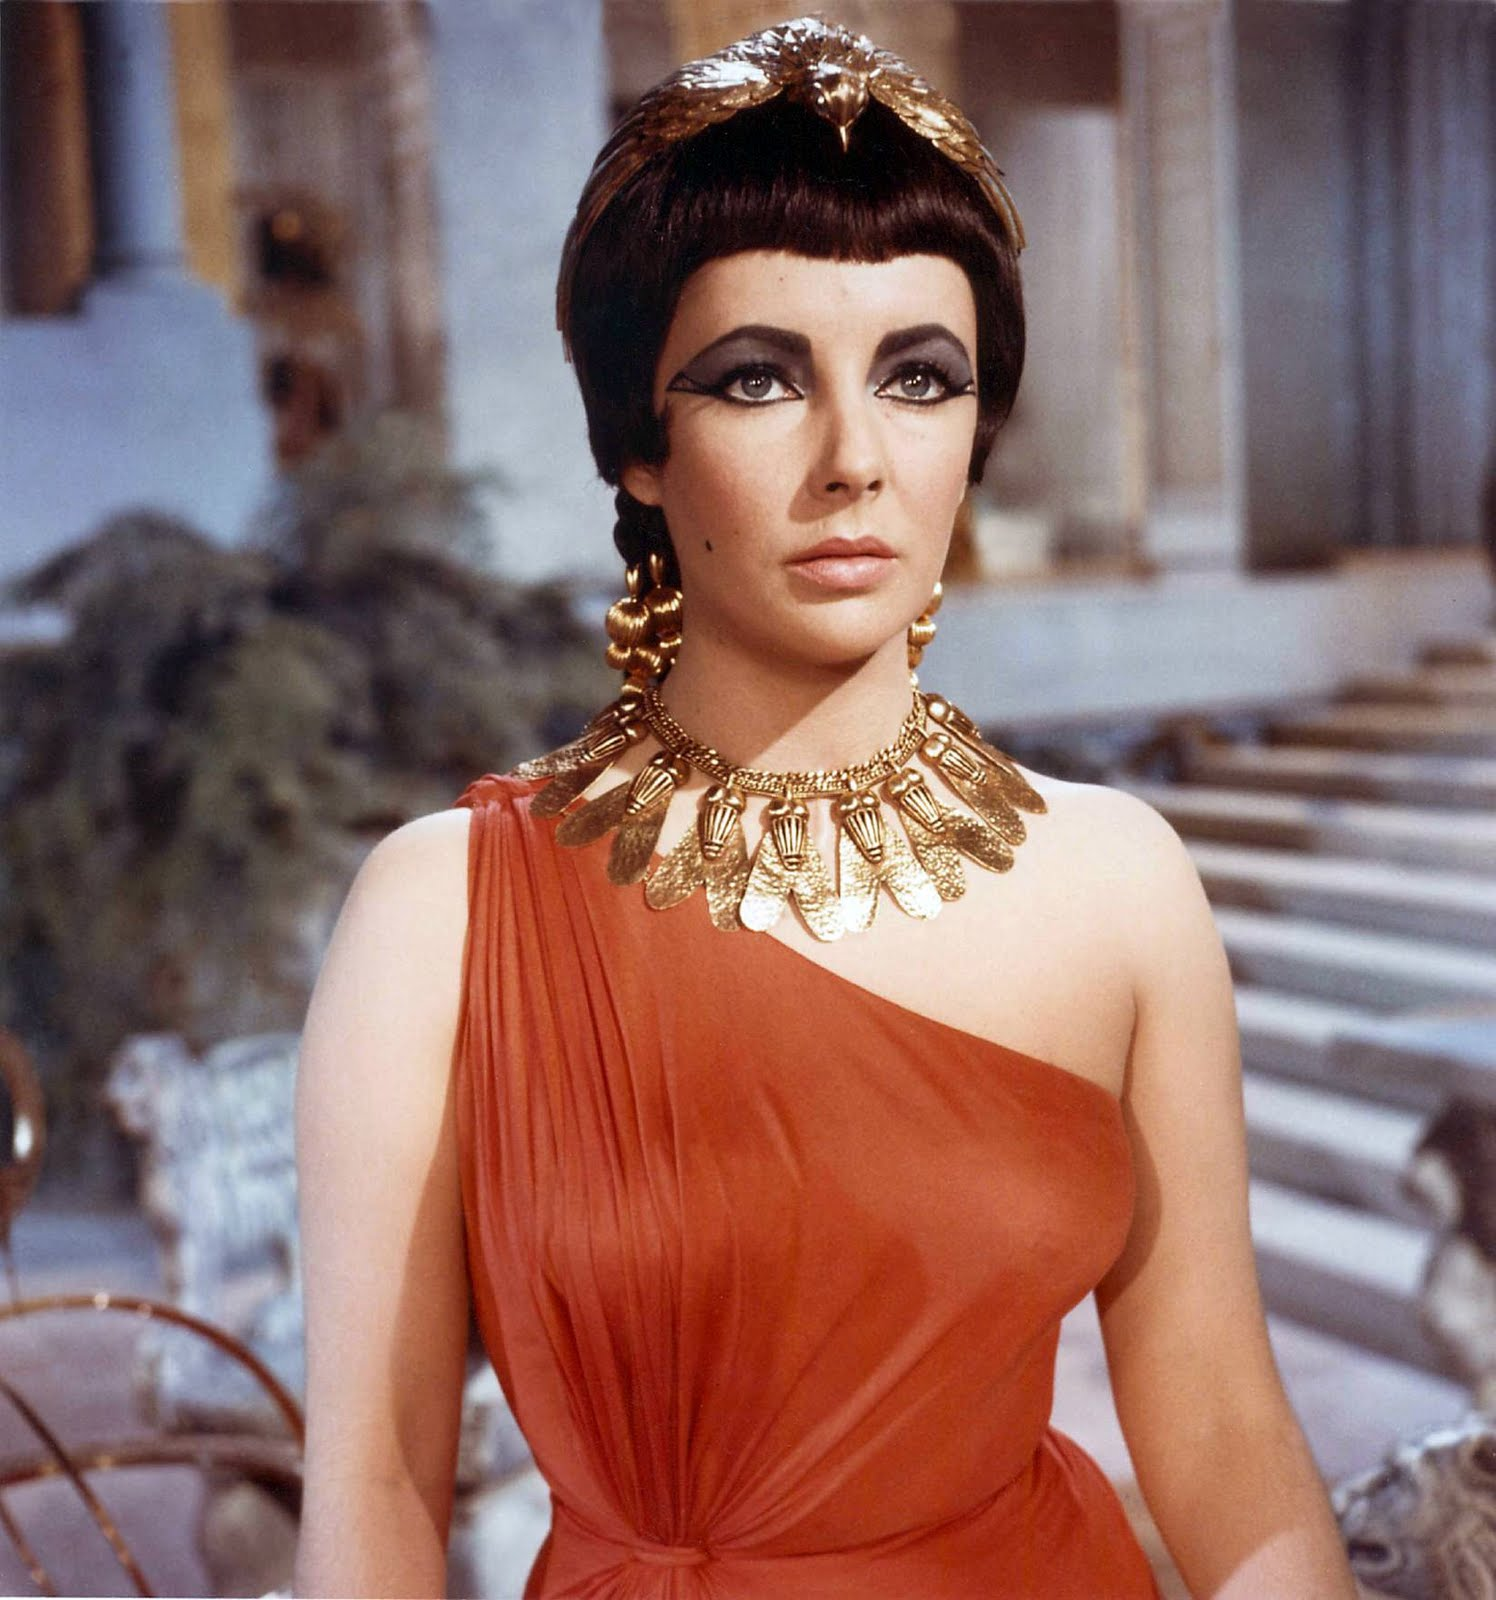 http://3.bp.blogspot.com/_uMEEYNzfGxI/TCn7XQ3mliI/AAAAAAAAGSc/LOqMJeNrwJk/s1600/taylor-elizabeth-cleopatra.jpg